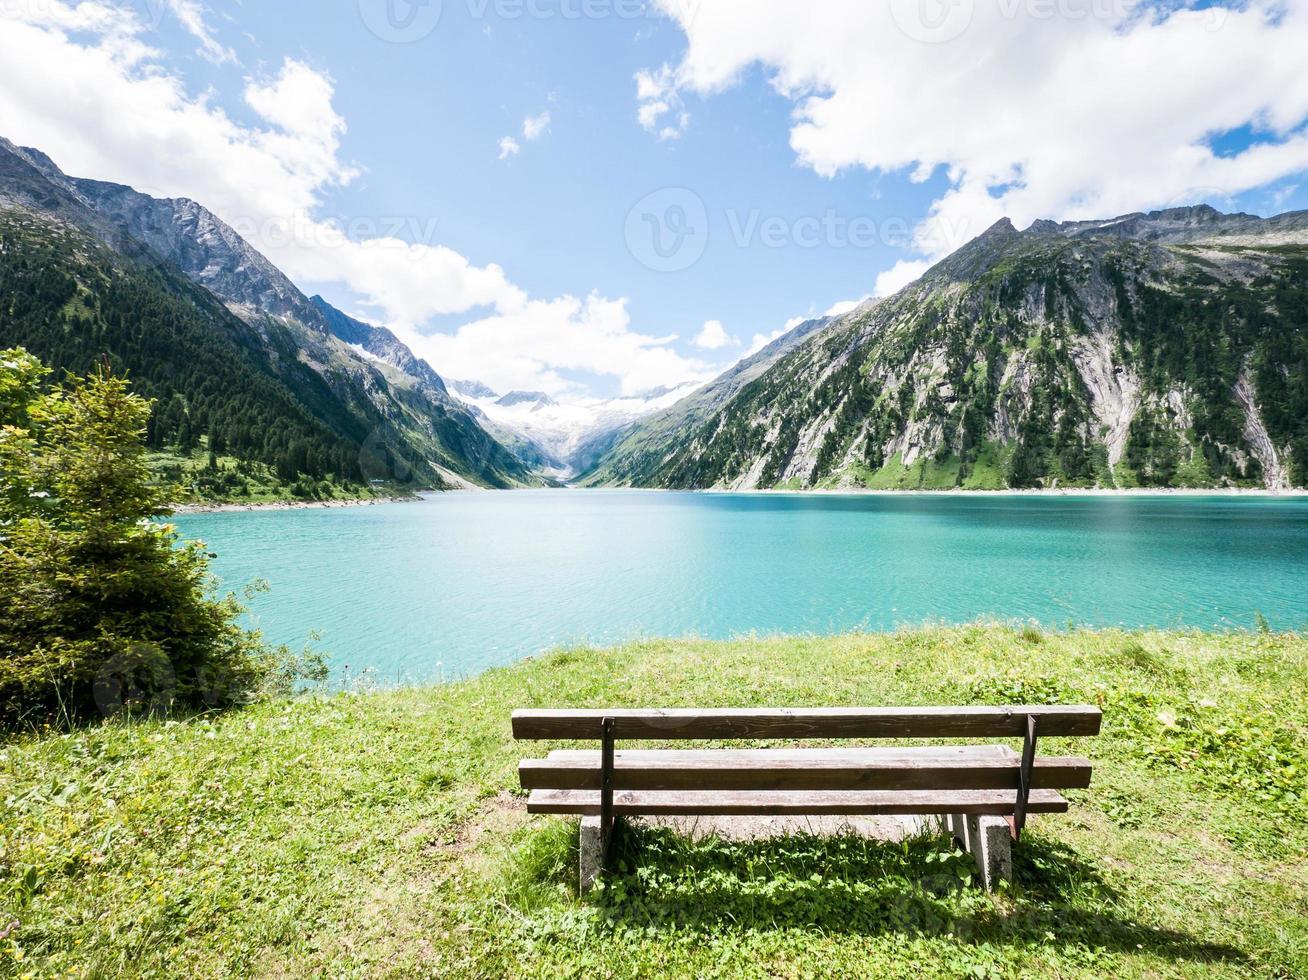 al lago foto